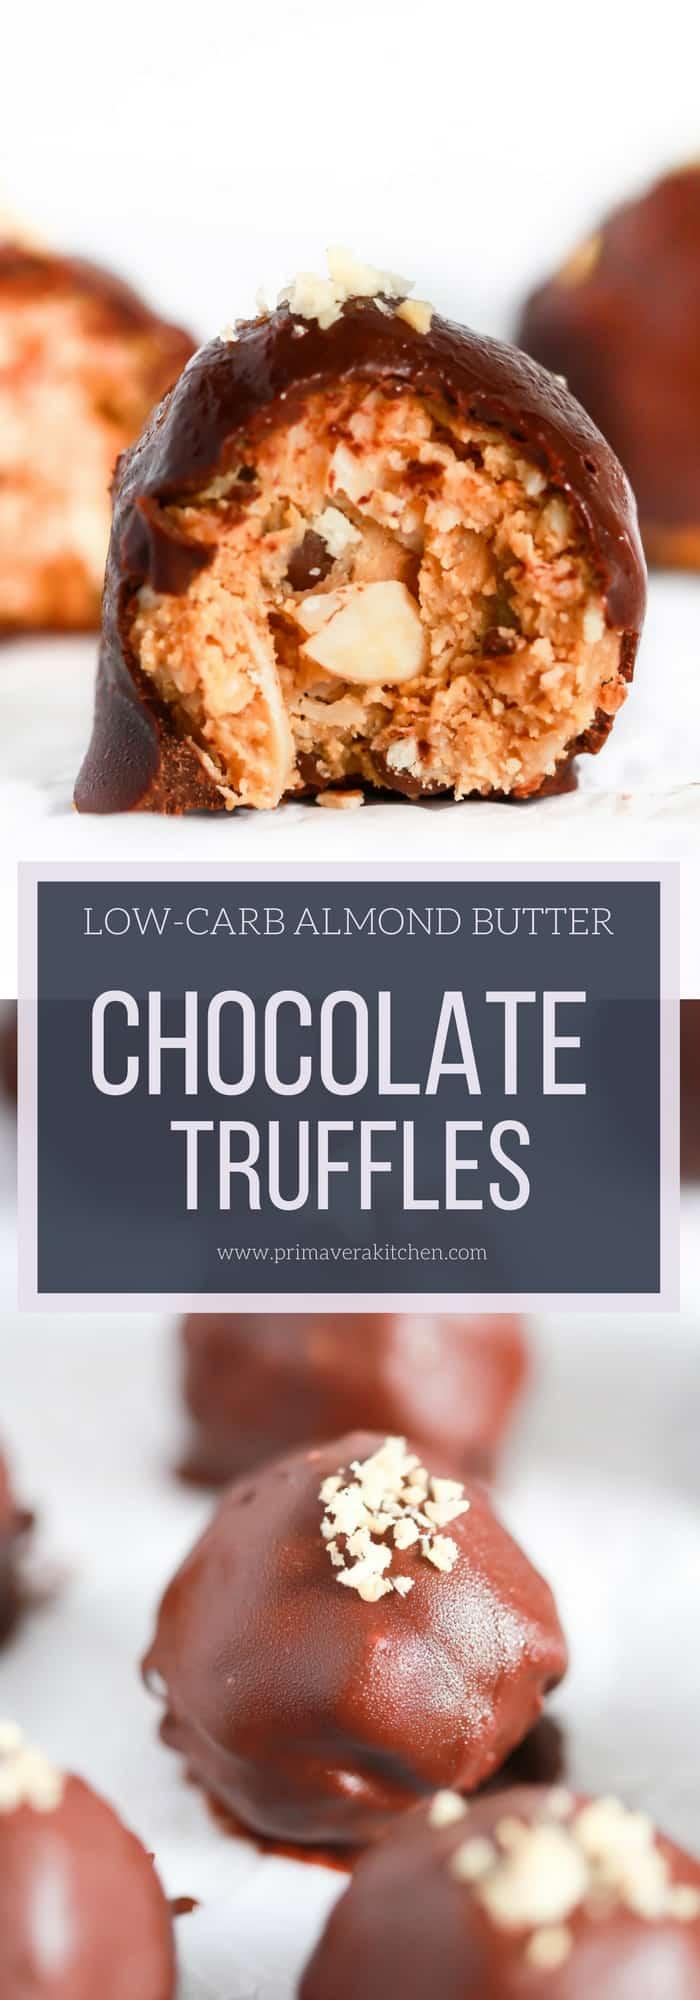 Low-carb-almond-butter-chocolate-truffles Primavera Kitchen